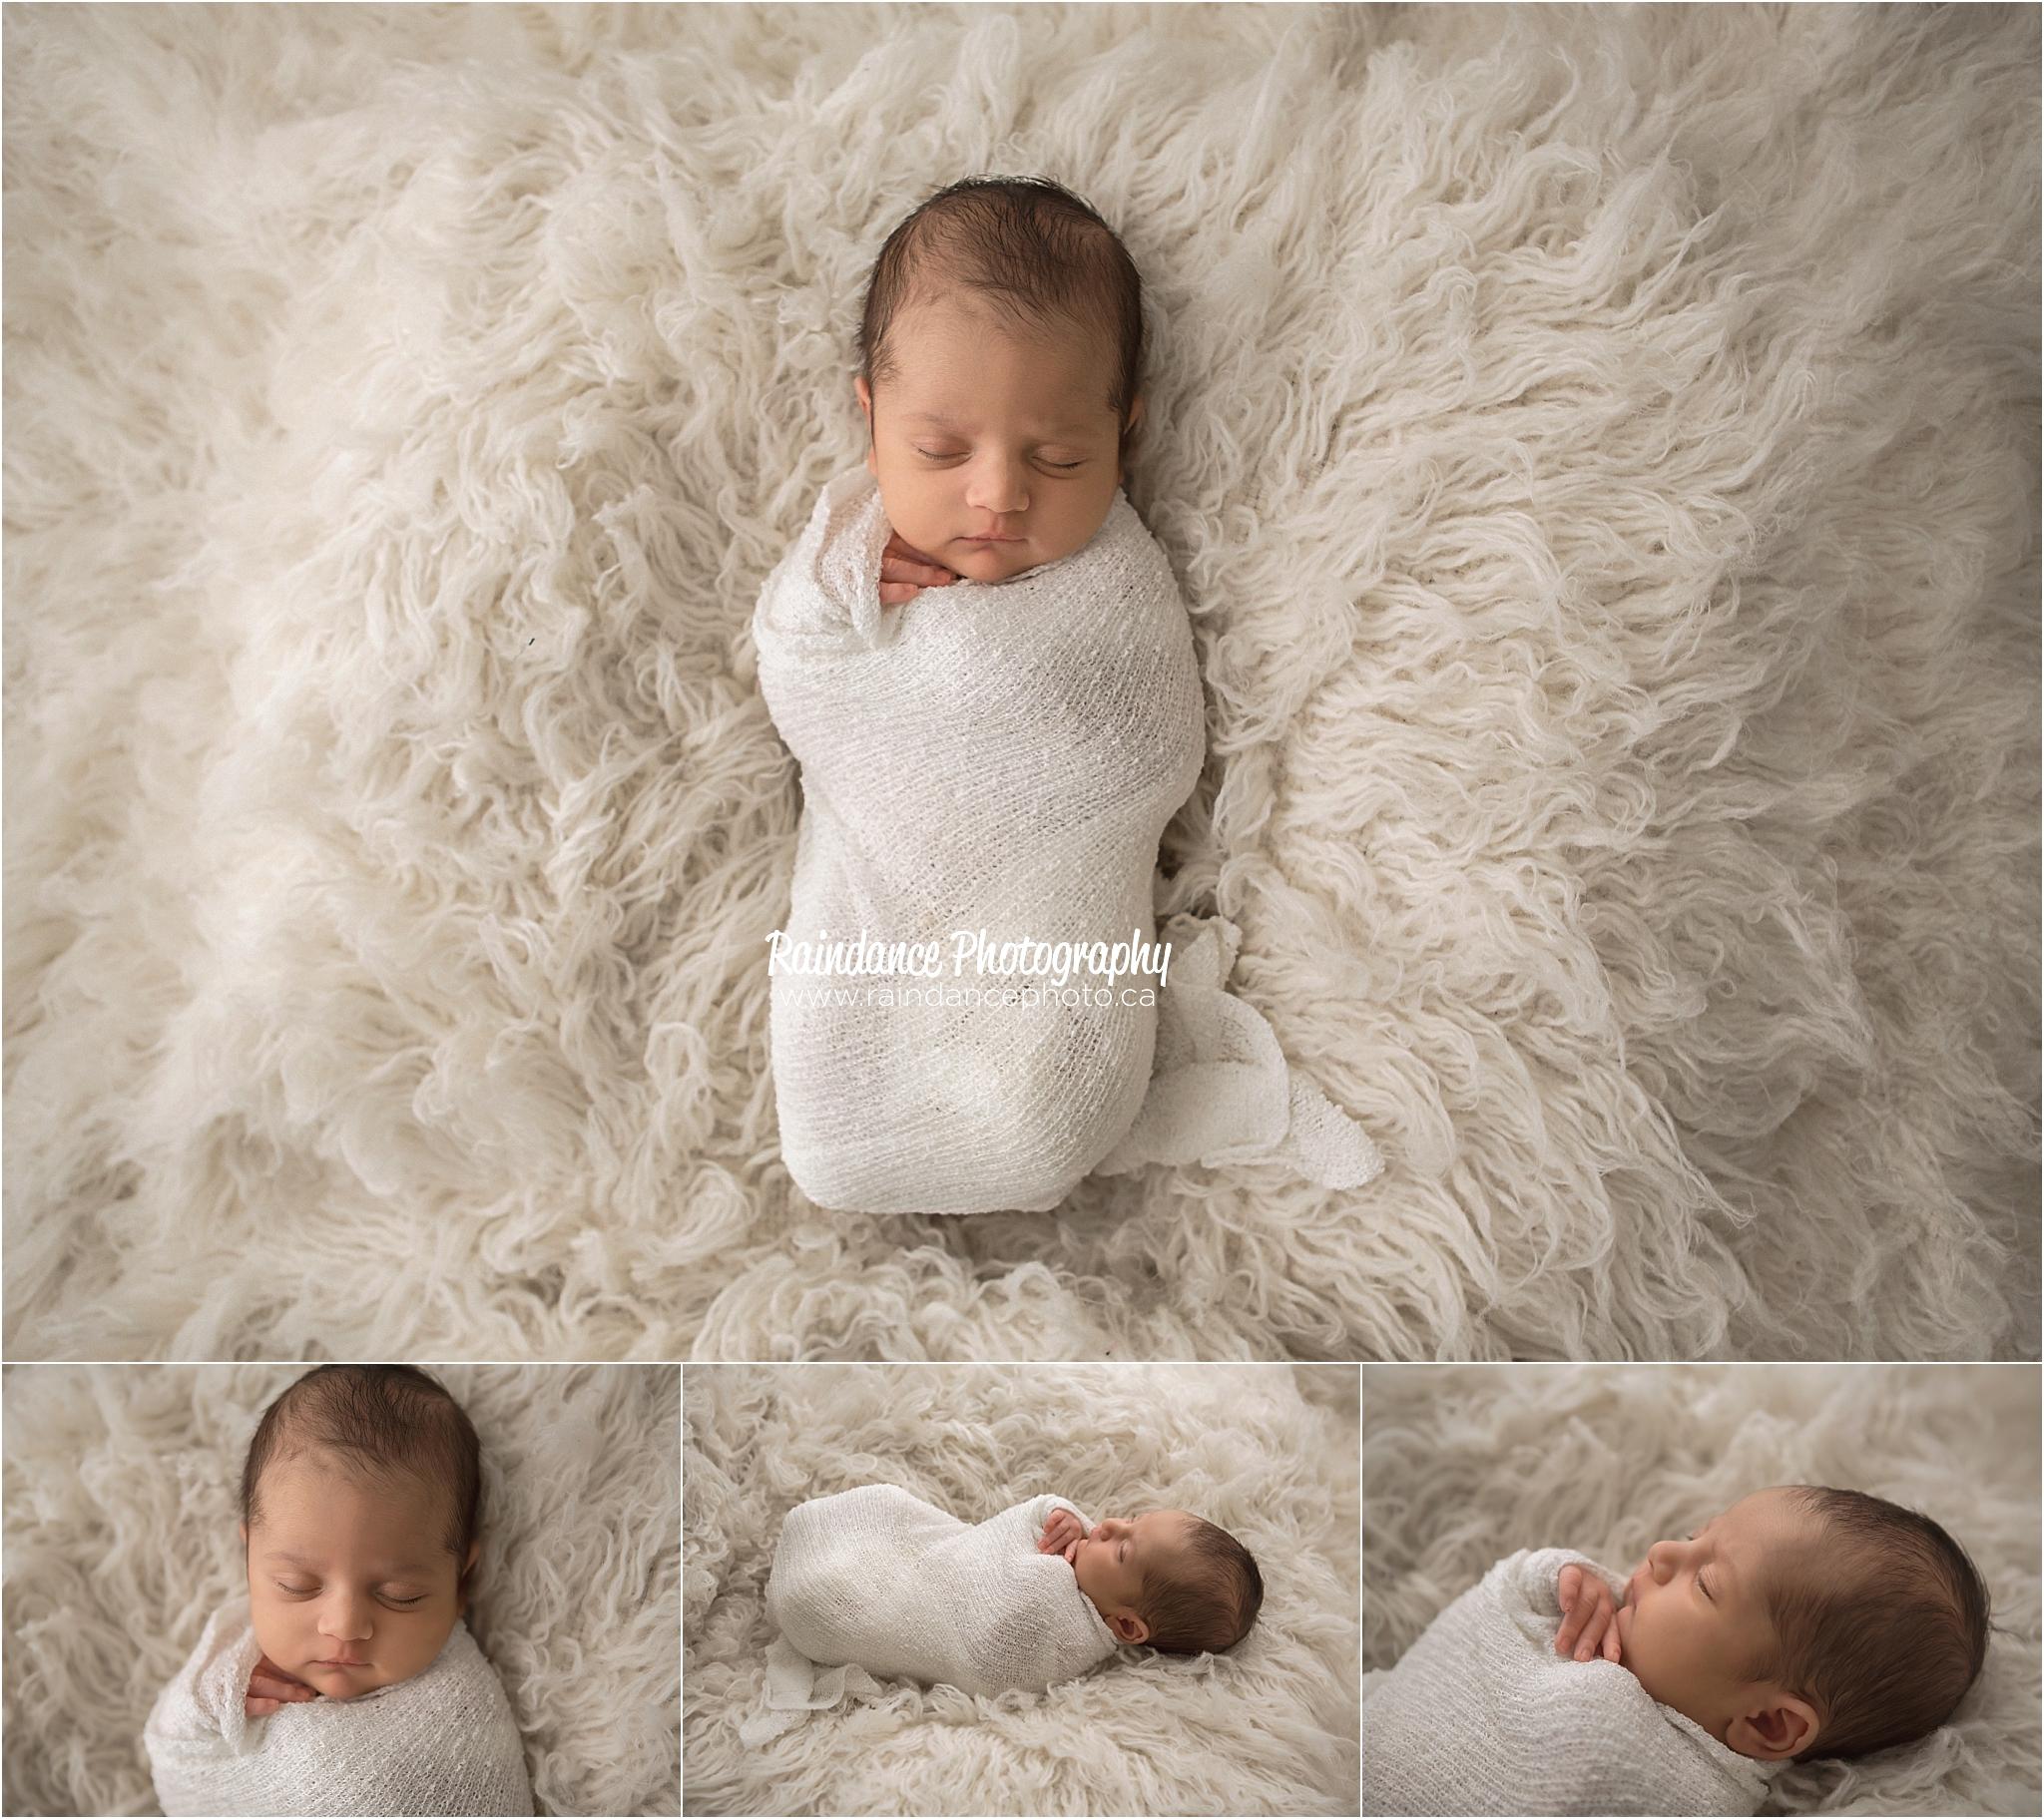 Raindance photography orillia baby photographer archives